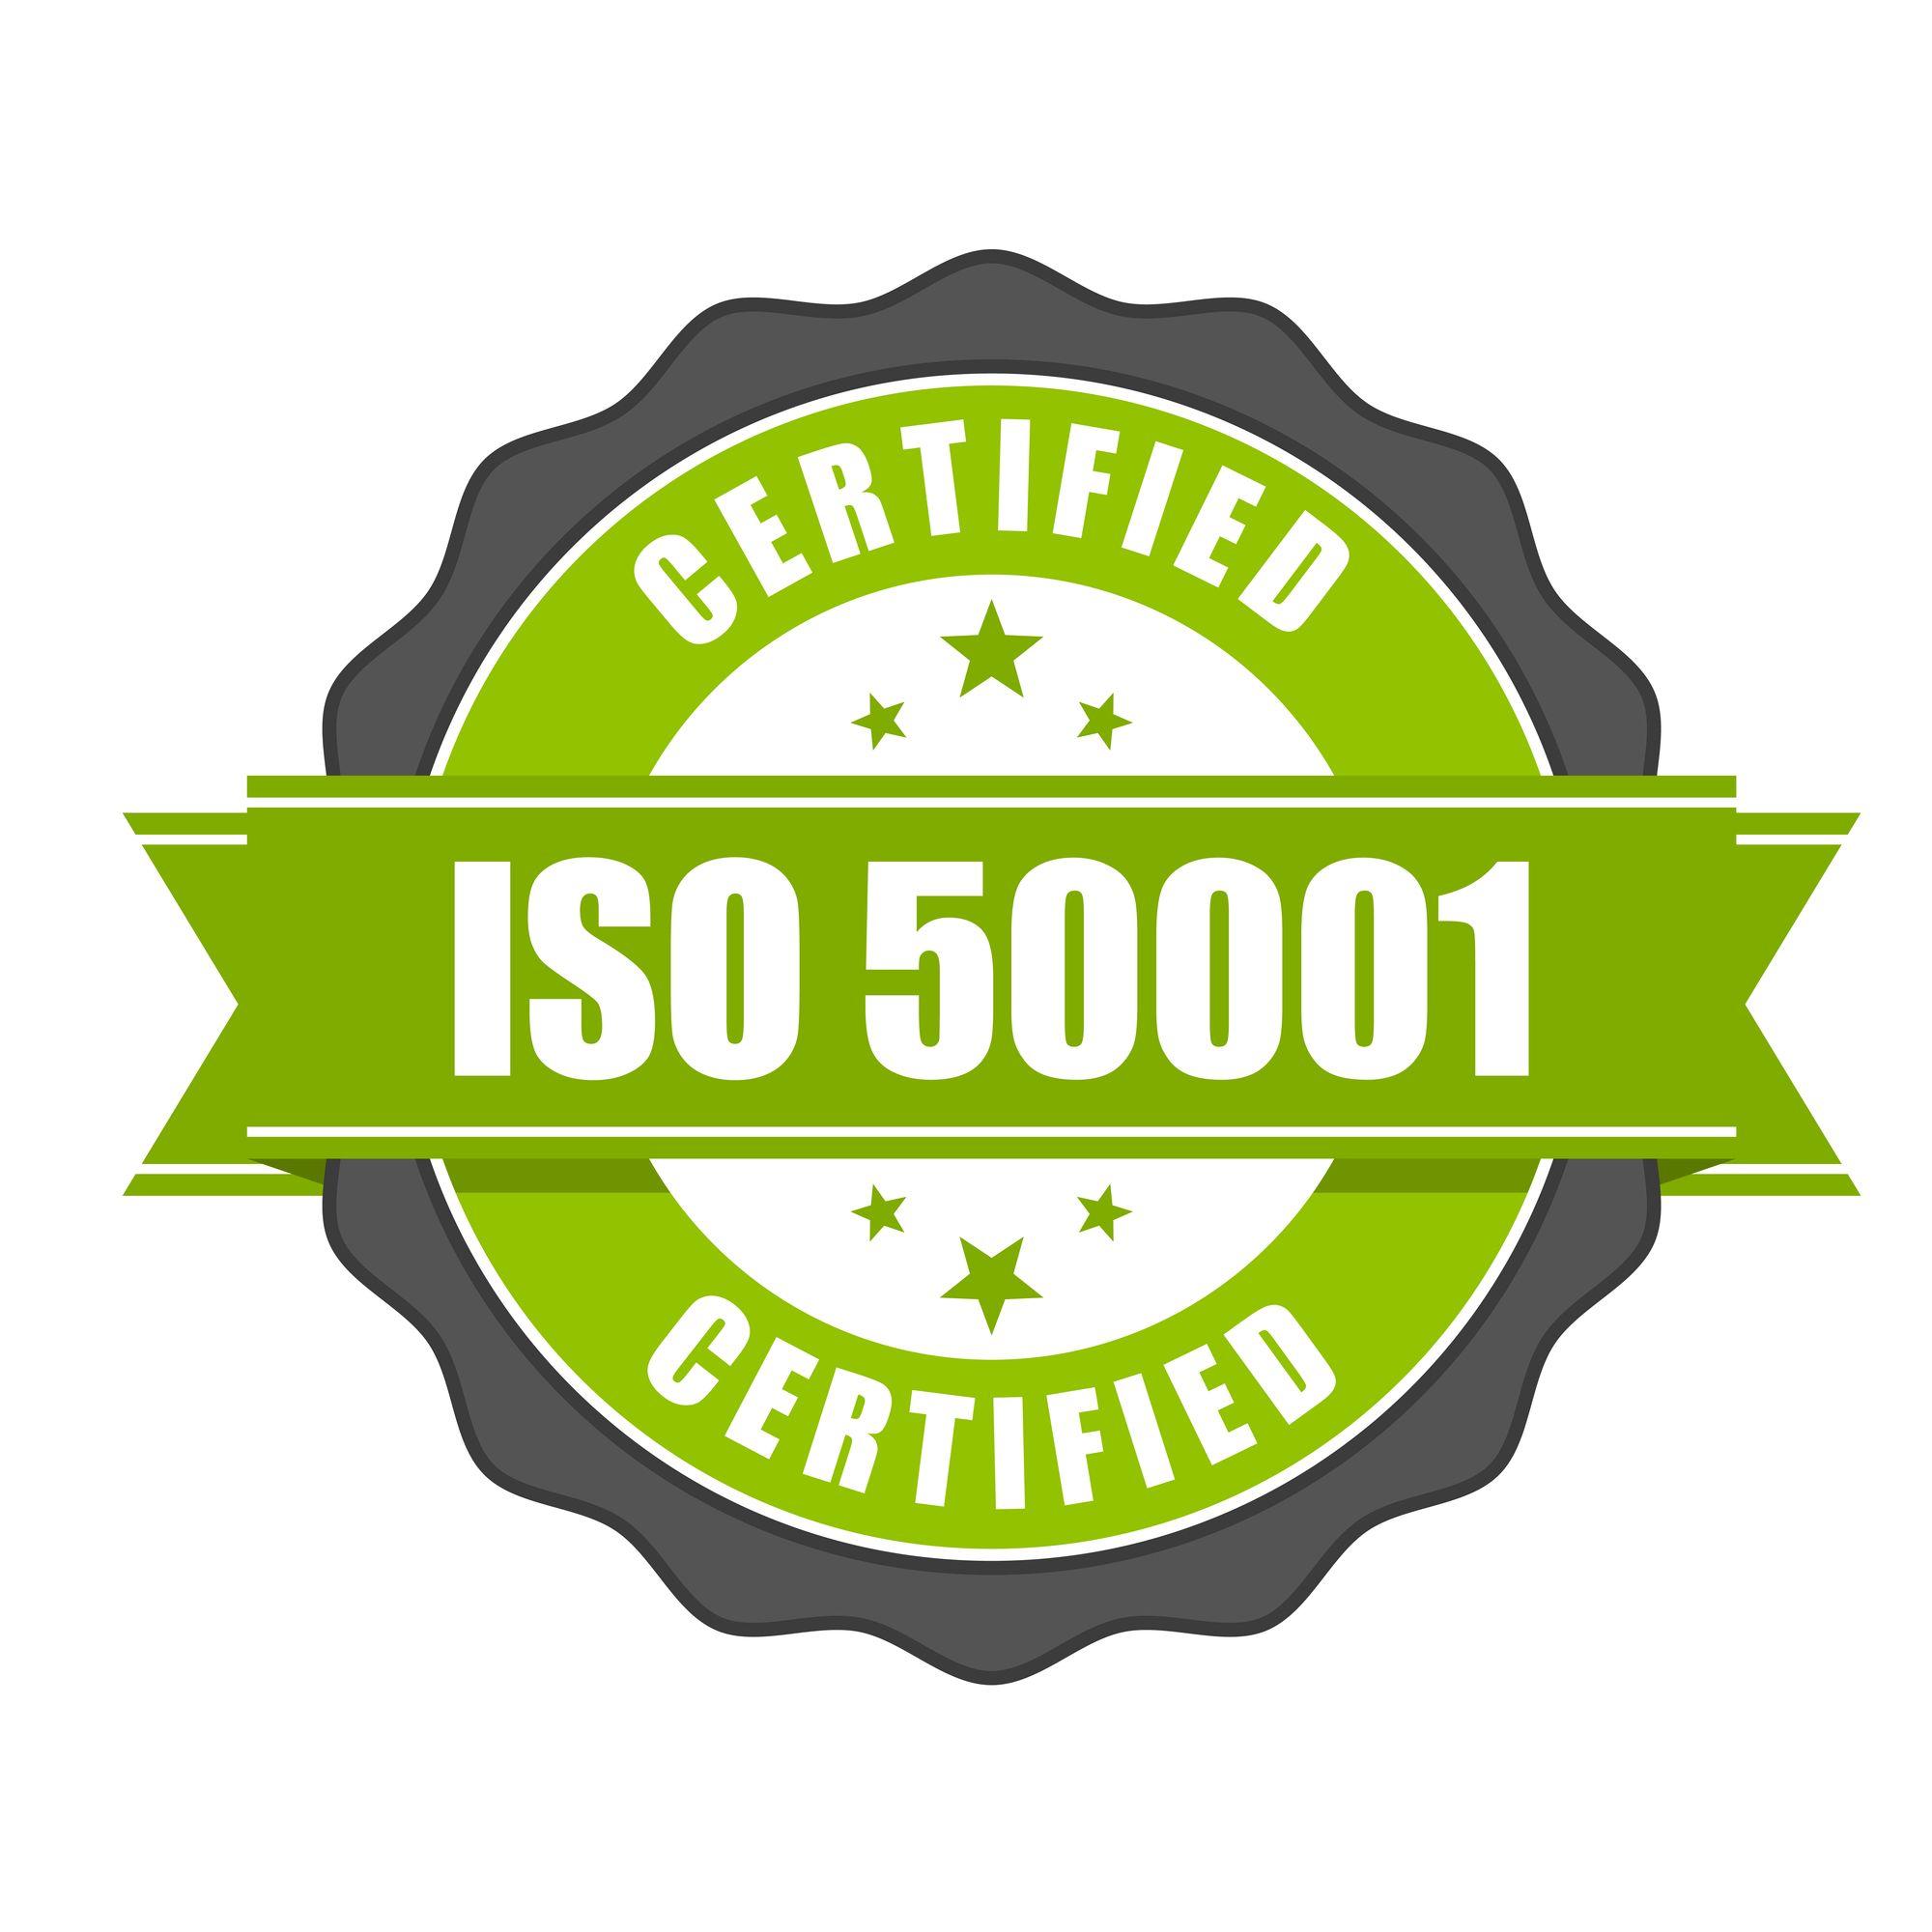 UNE-EN ISO 50001